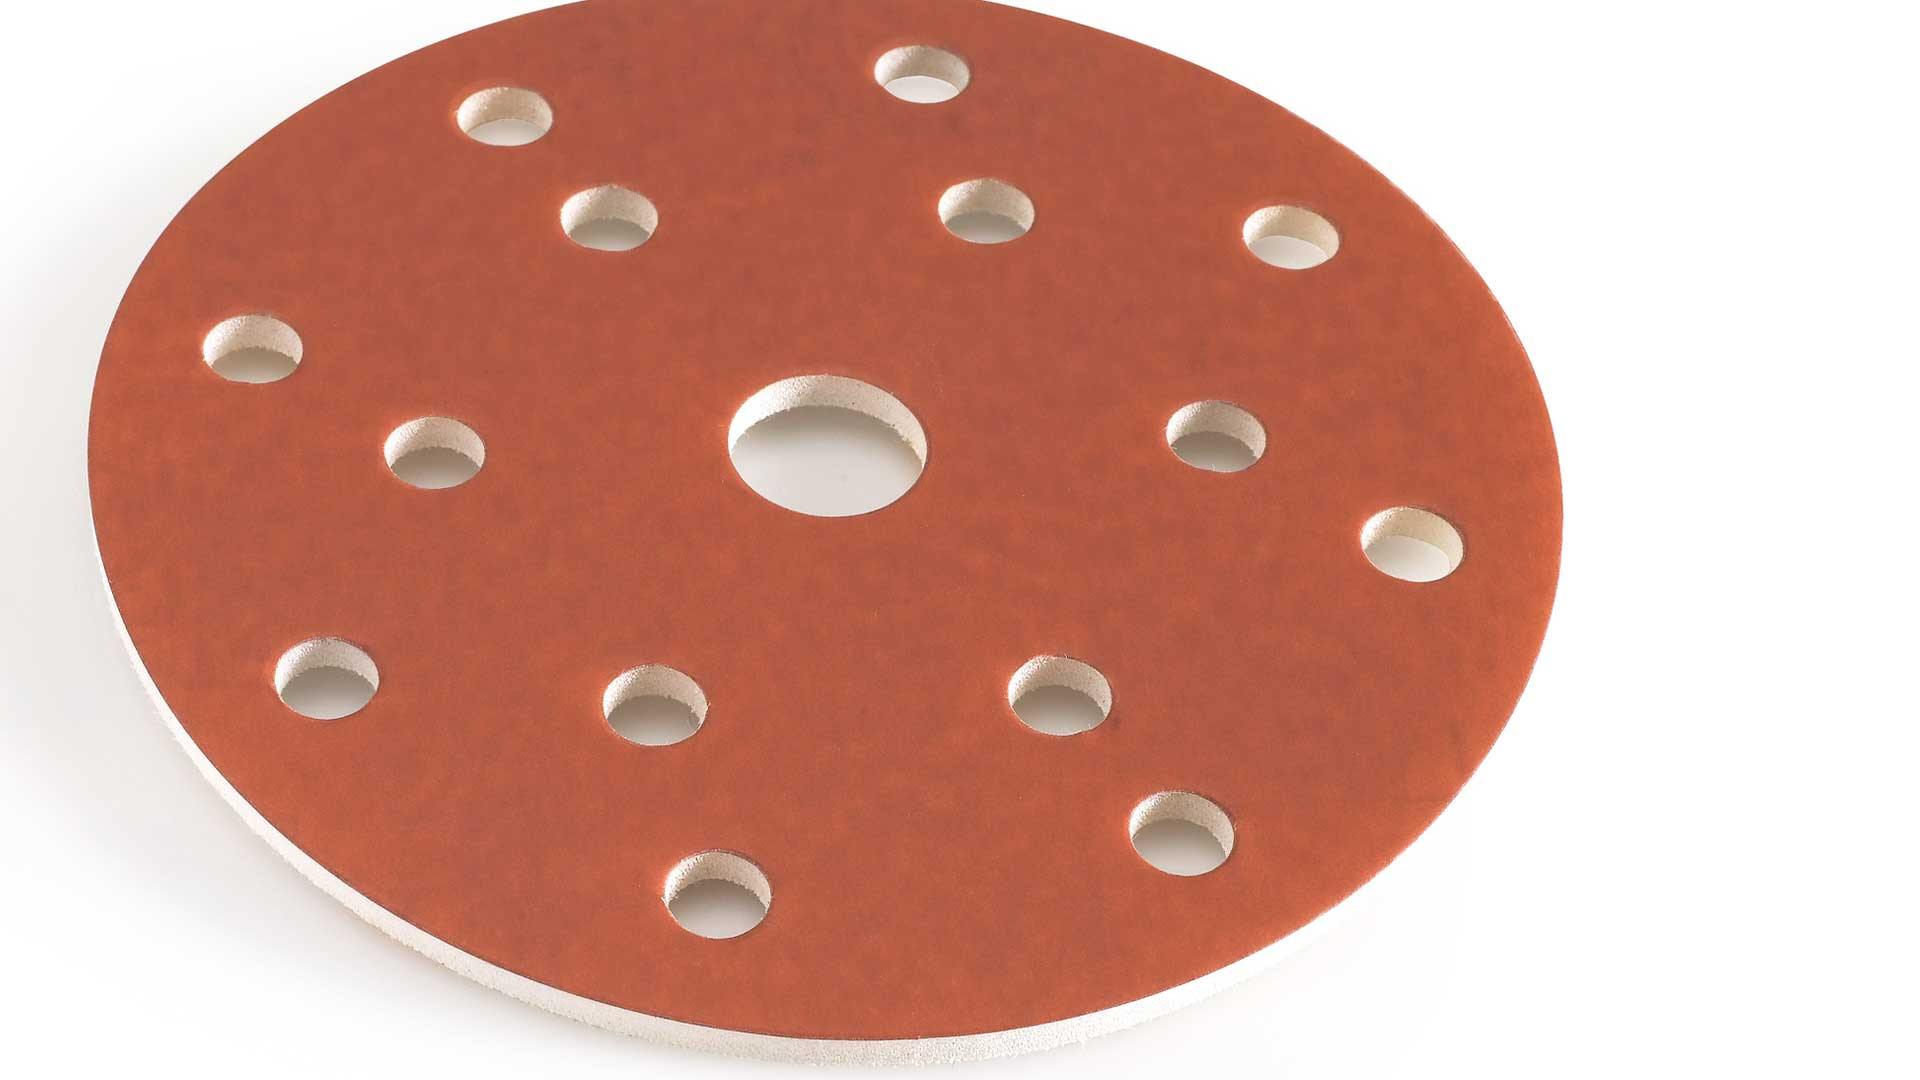 INDASA Abrasives Rhynofinish Red Line close up on white background